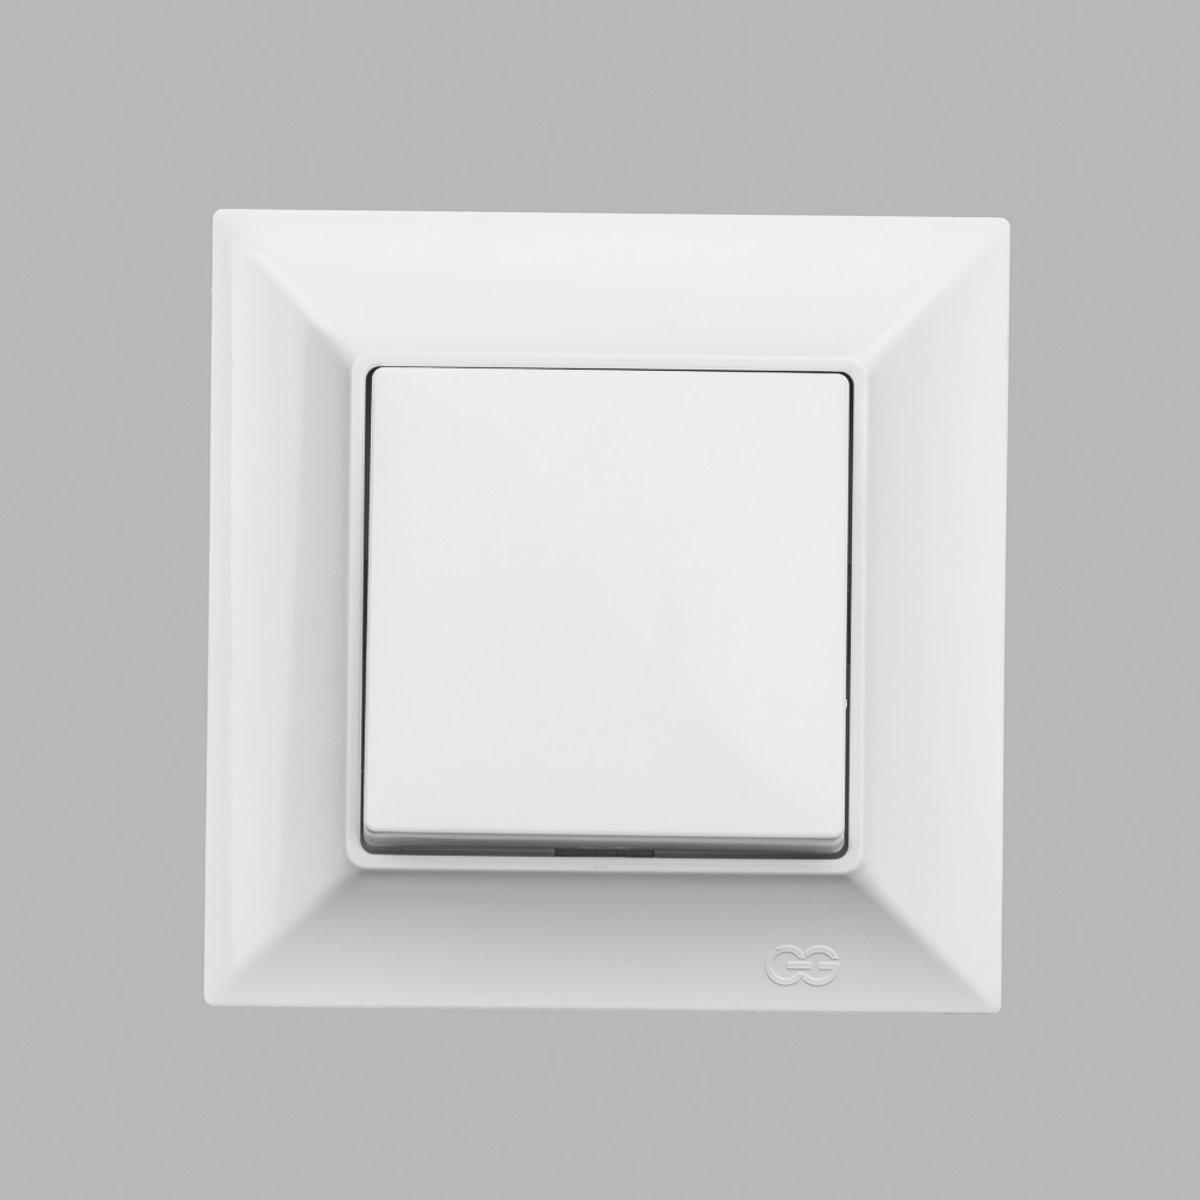 Neoline выключатель 1-ый белый